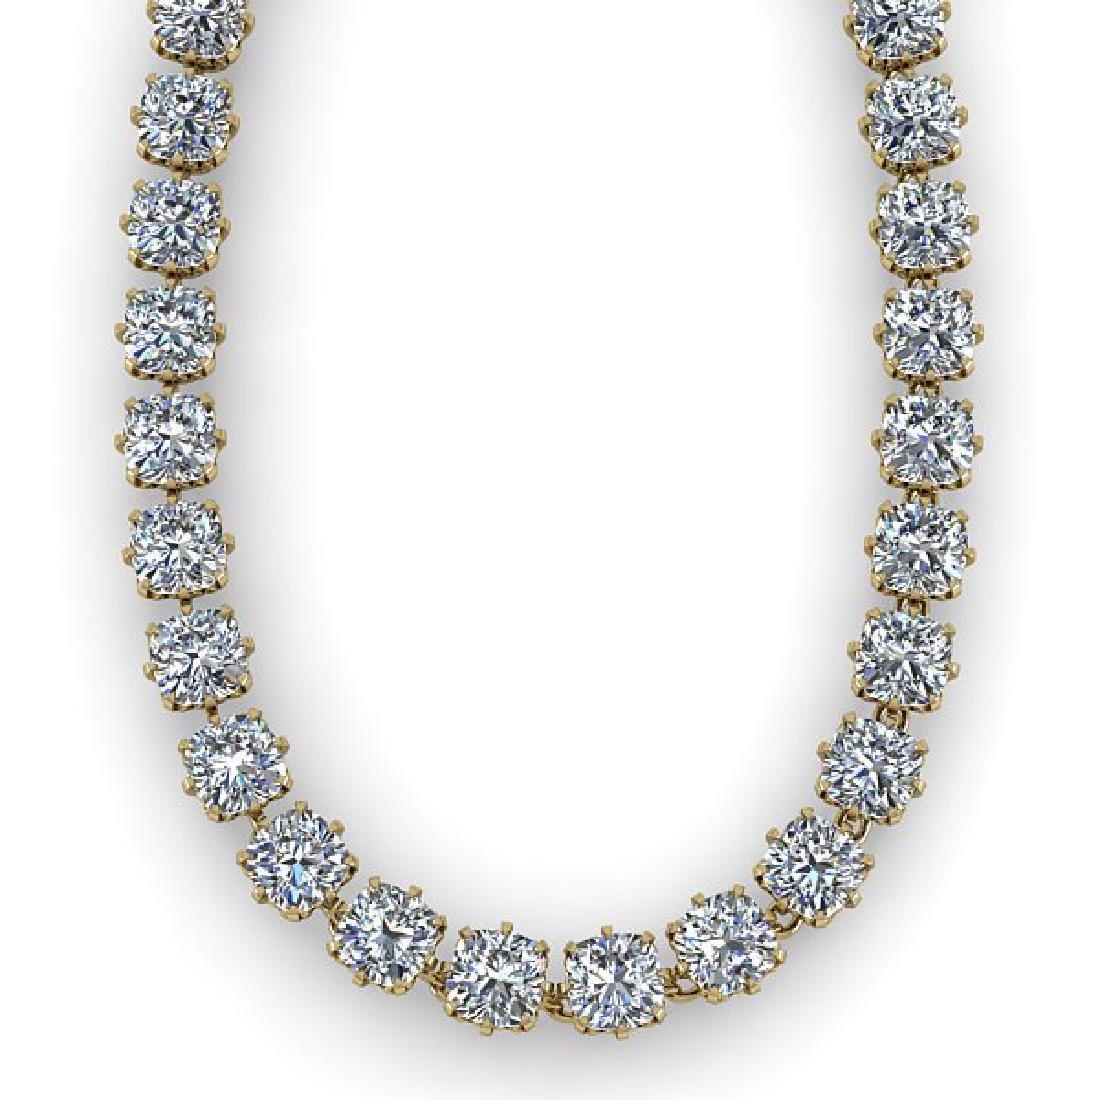 28 CTW Oval Cut SI Certified Diamond Necklace 18K - 2